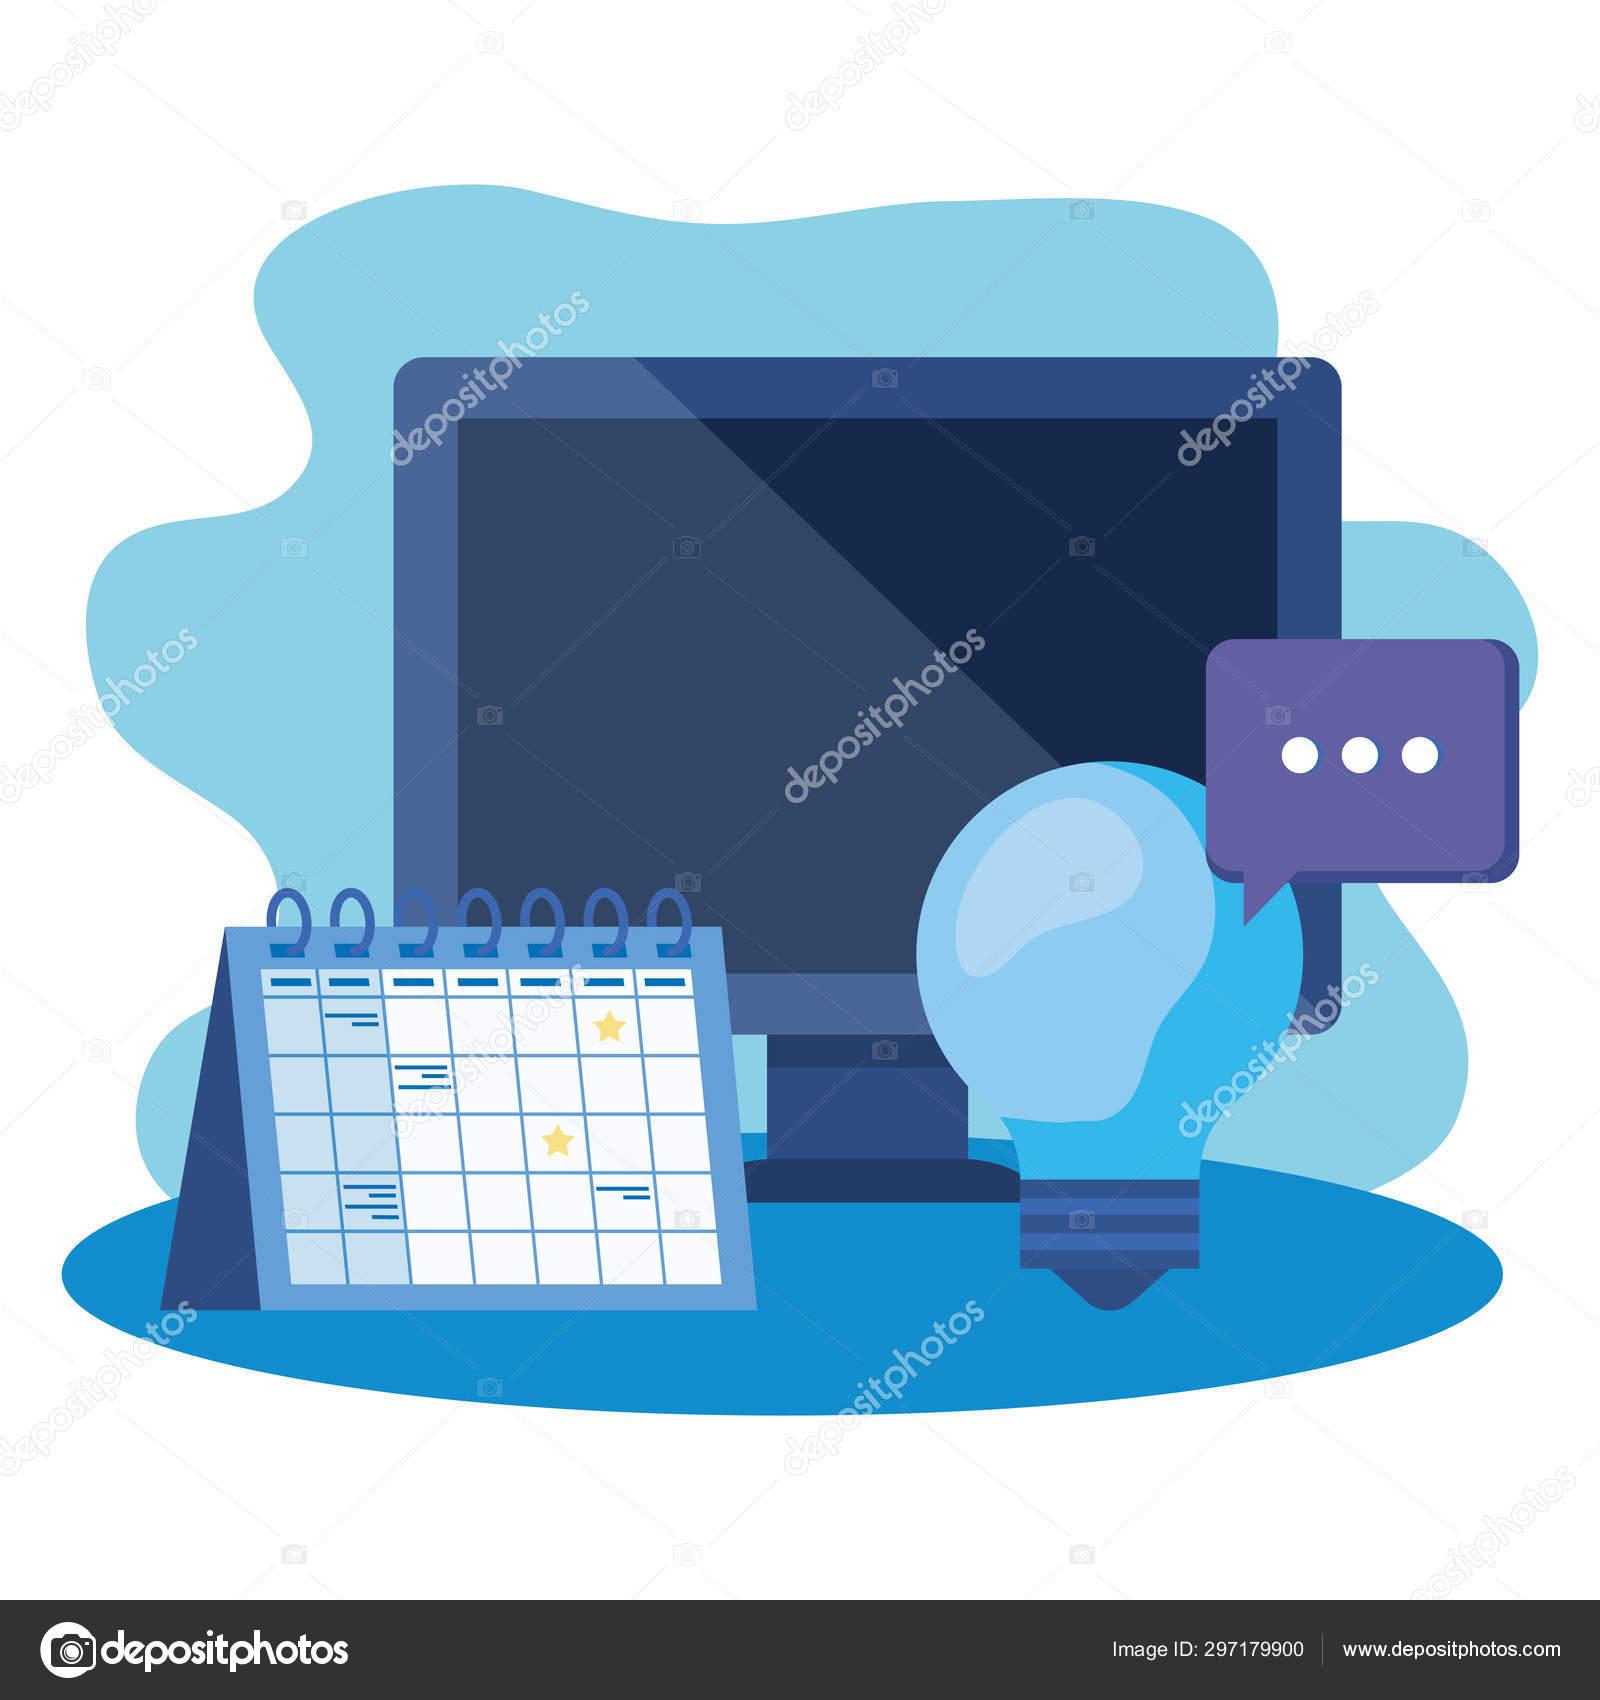 Desktop Computer With Calendar Reminder — Stock Vector within Desktop Reminder Gadget